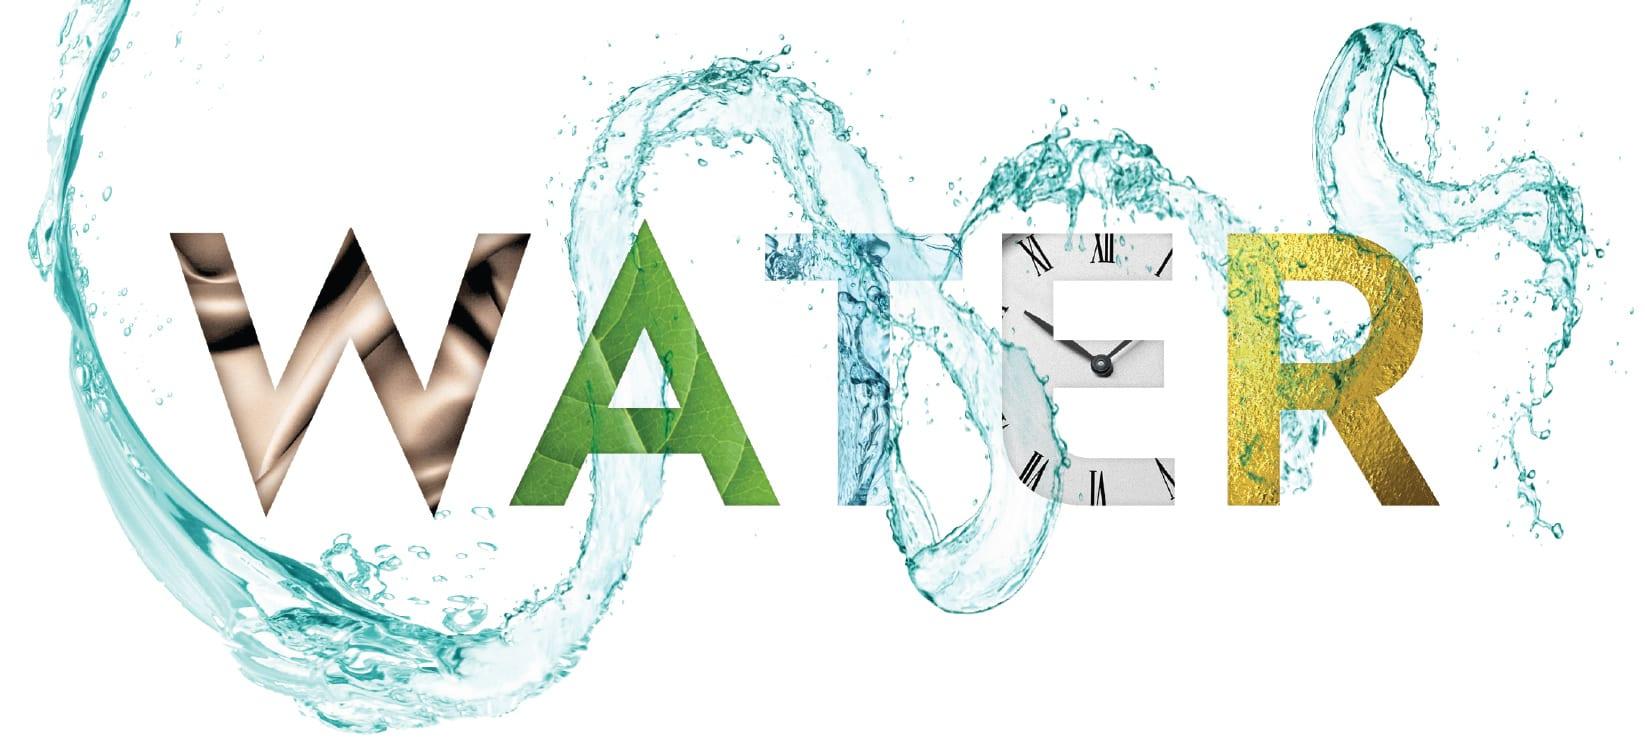 water-lagoon-advanced-care